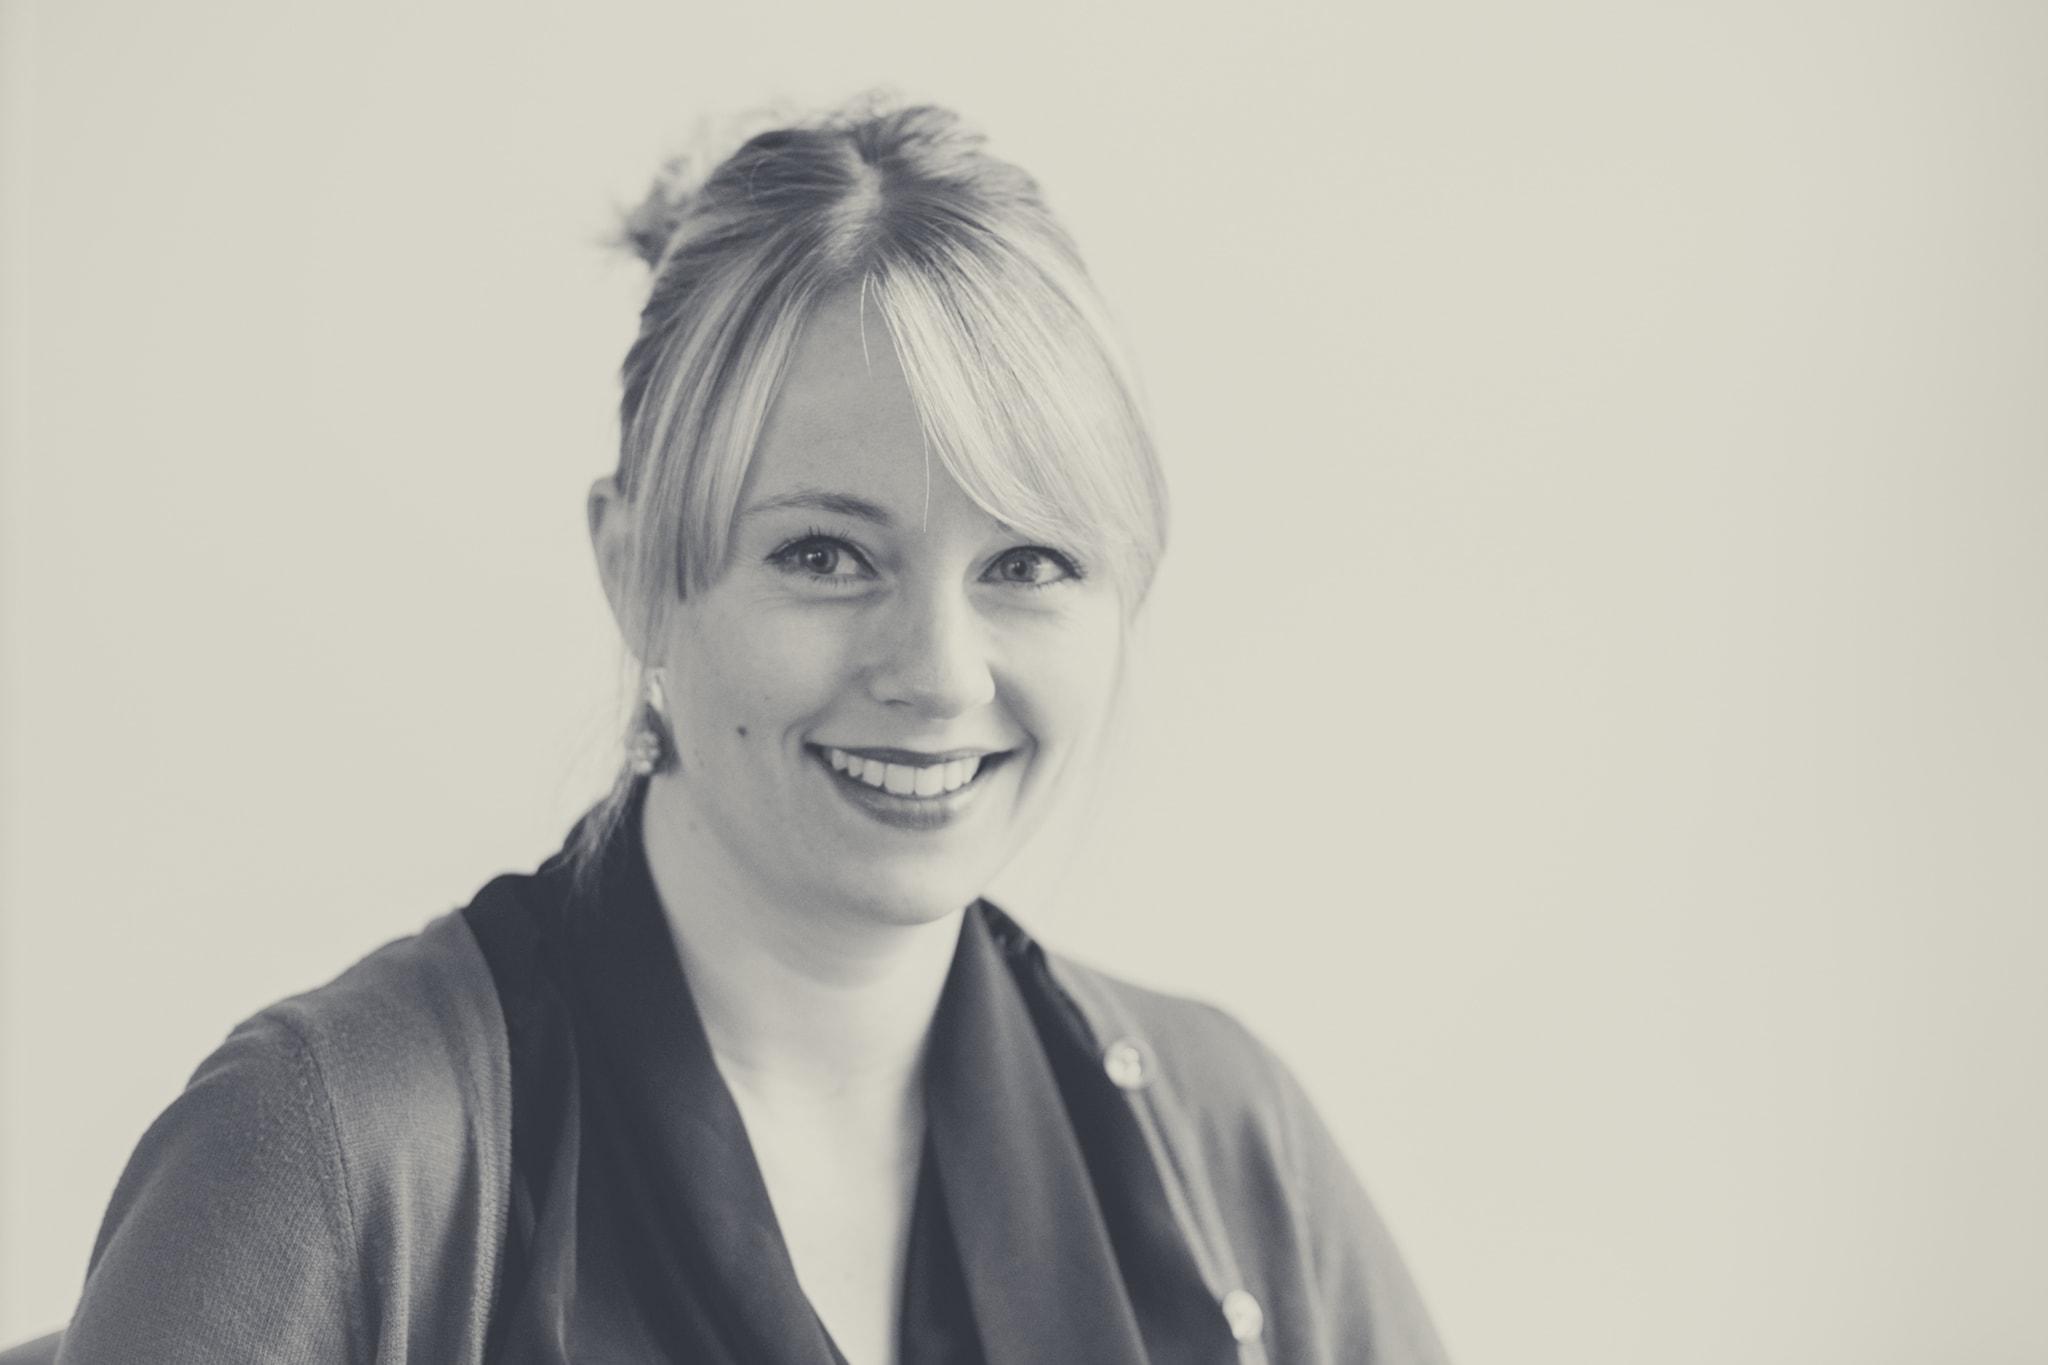 Claire Berg